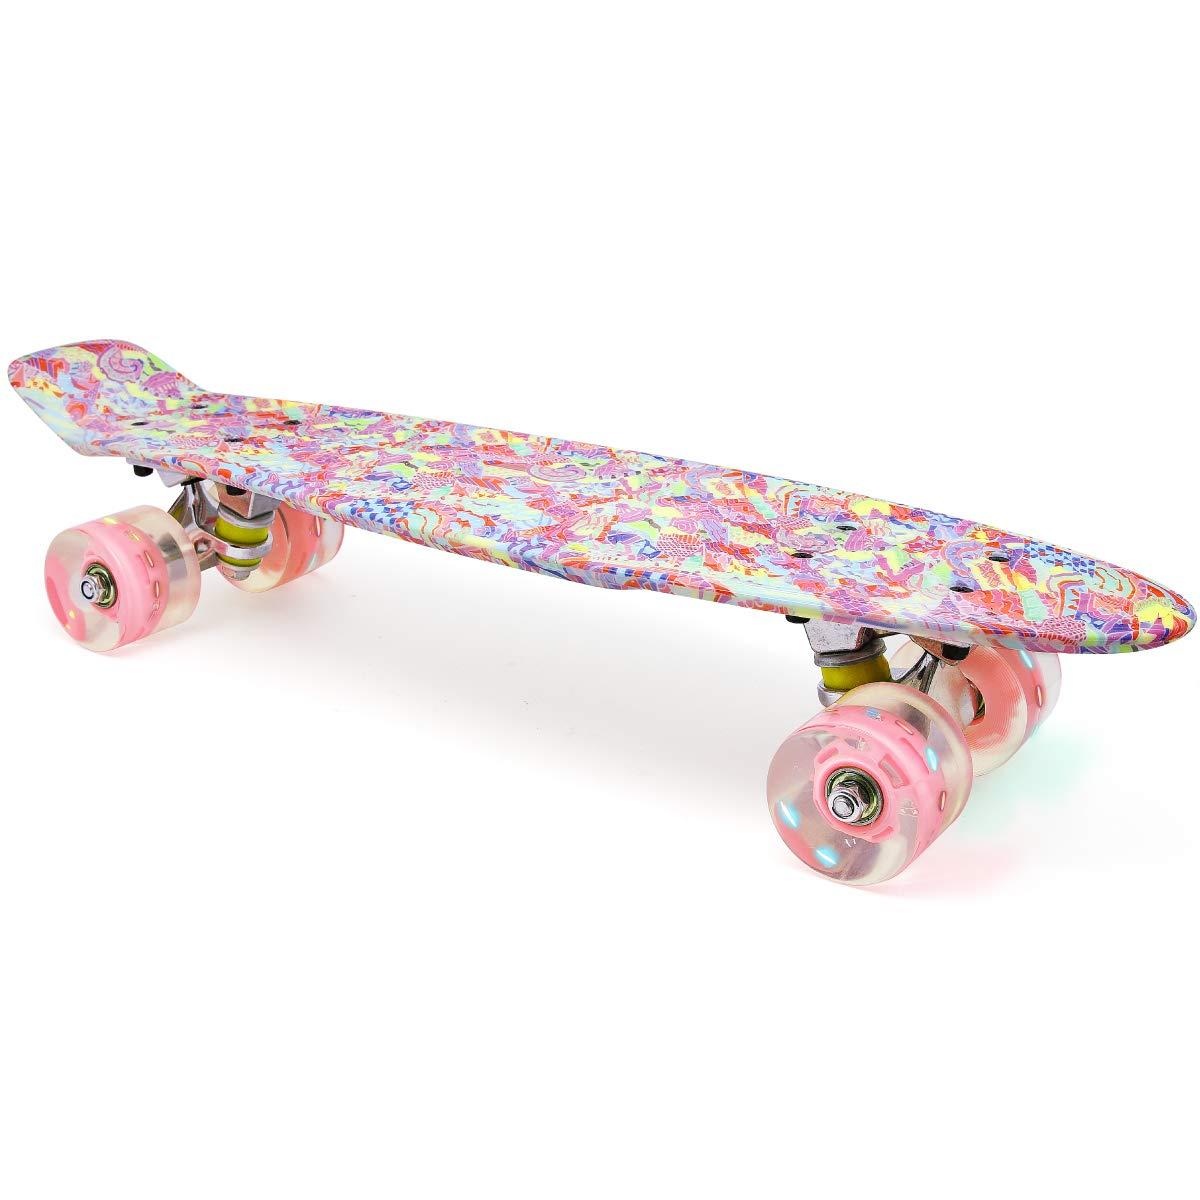 M Merkapa Skateboards with Colorful LED Skateboard Wheels - Great Skateboards for Kids to Adults, Beginners to Skateboarders(Sweet Pink)